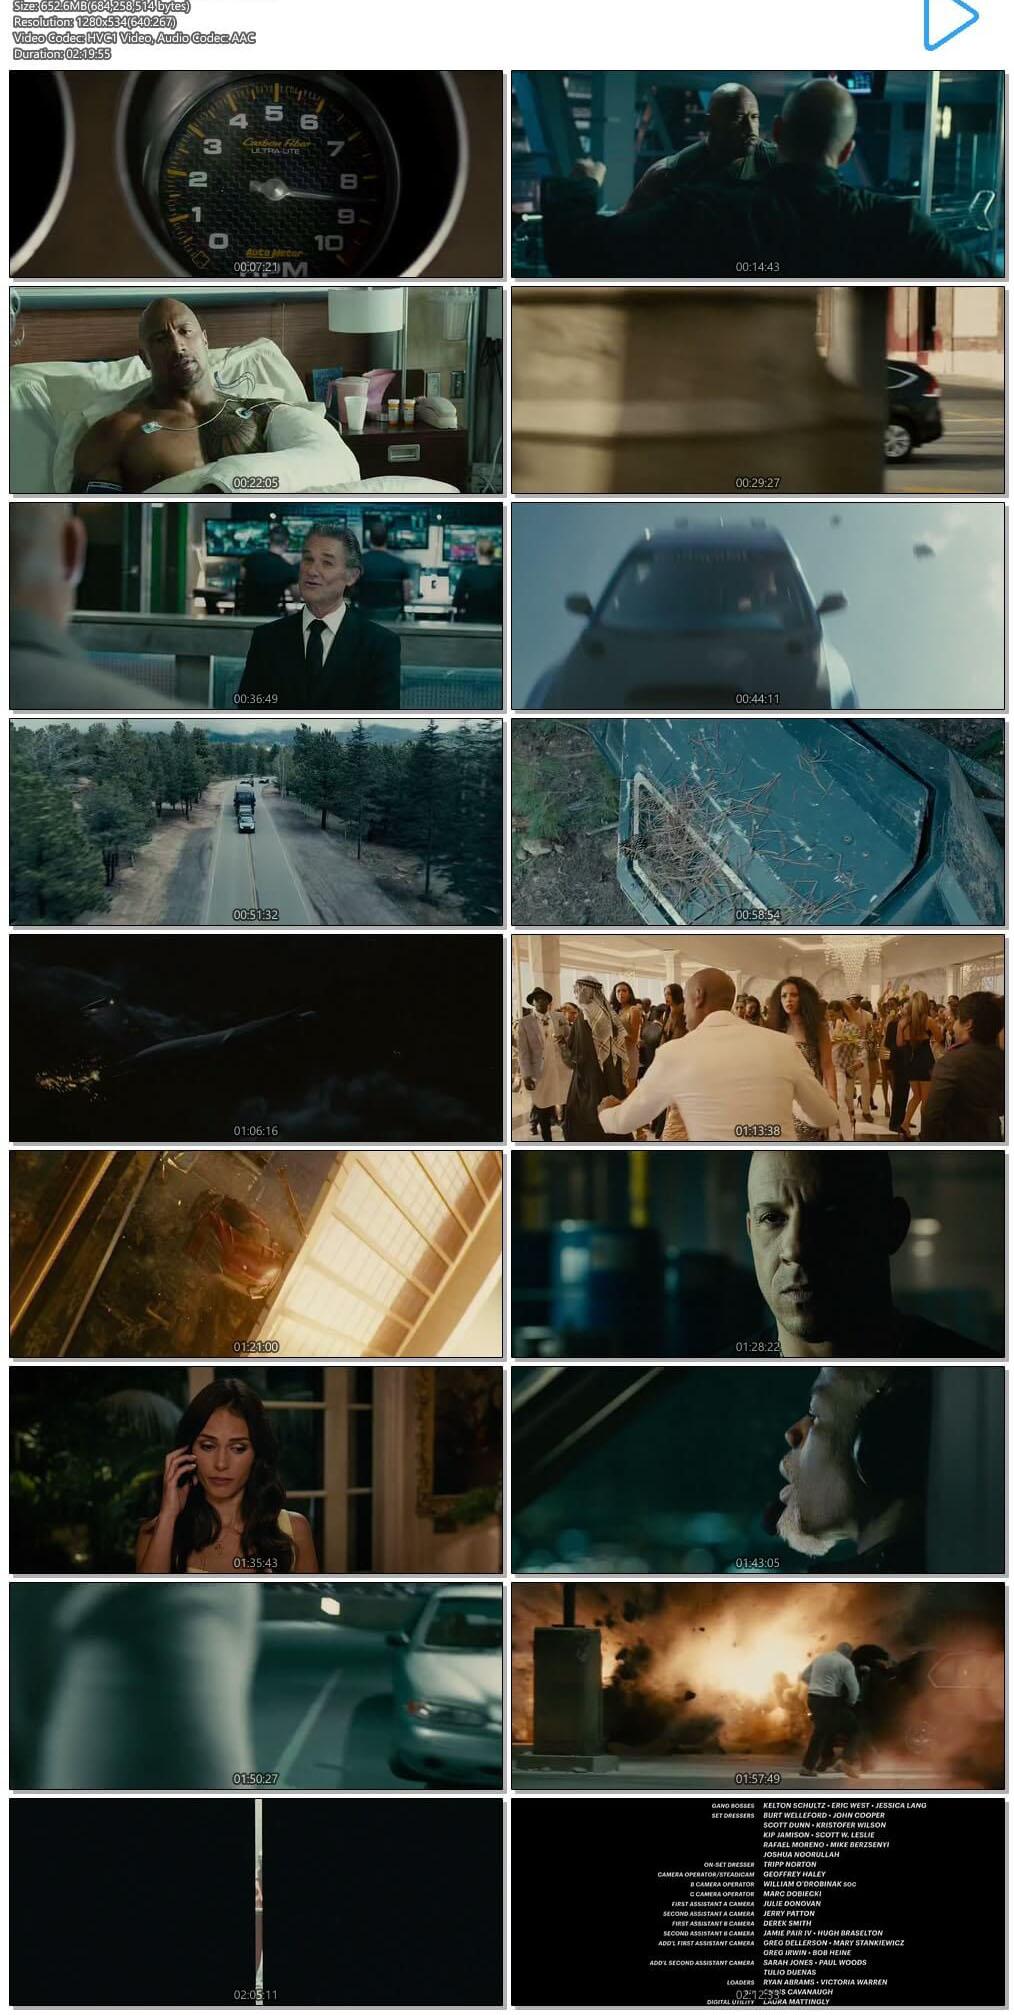 Furious Seven (2015) EXTENDED 720p BRRip x265 HEVC Dual Audio Eng Hindi ESubs-DLW